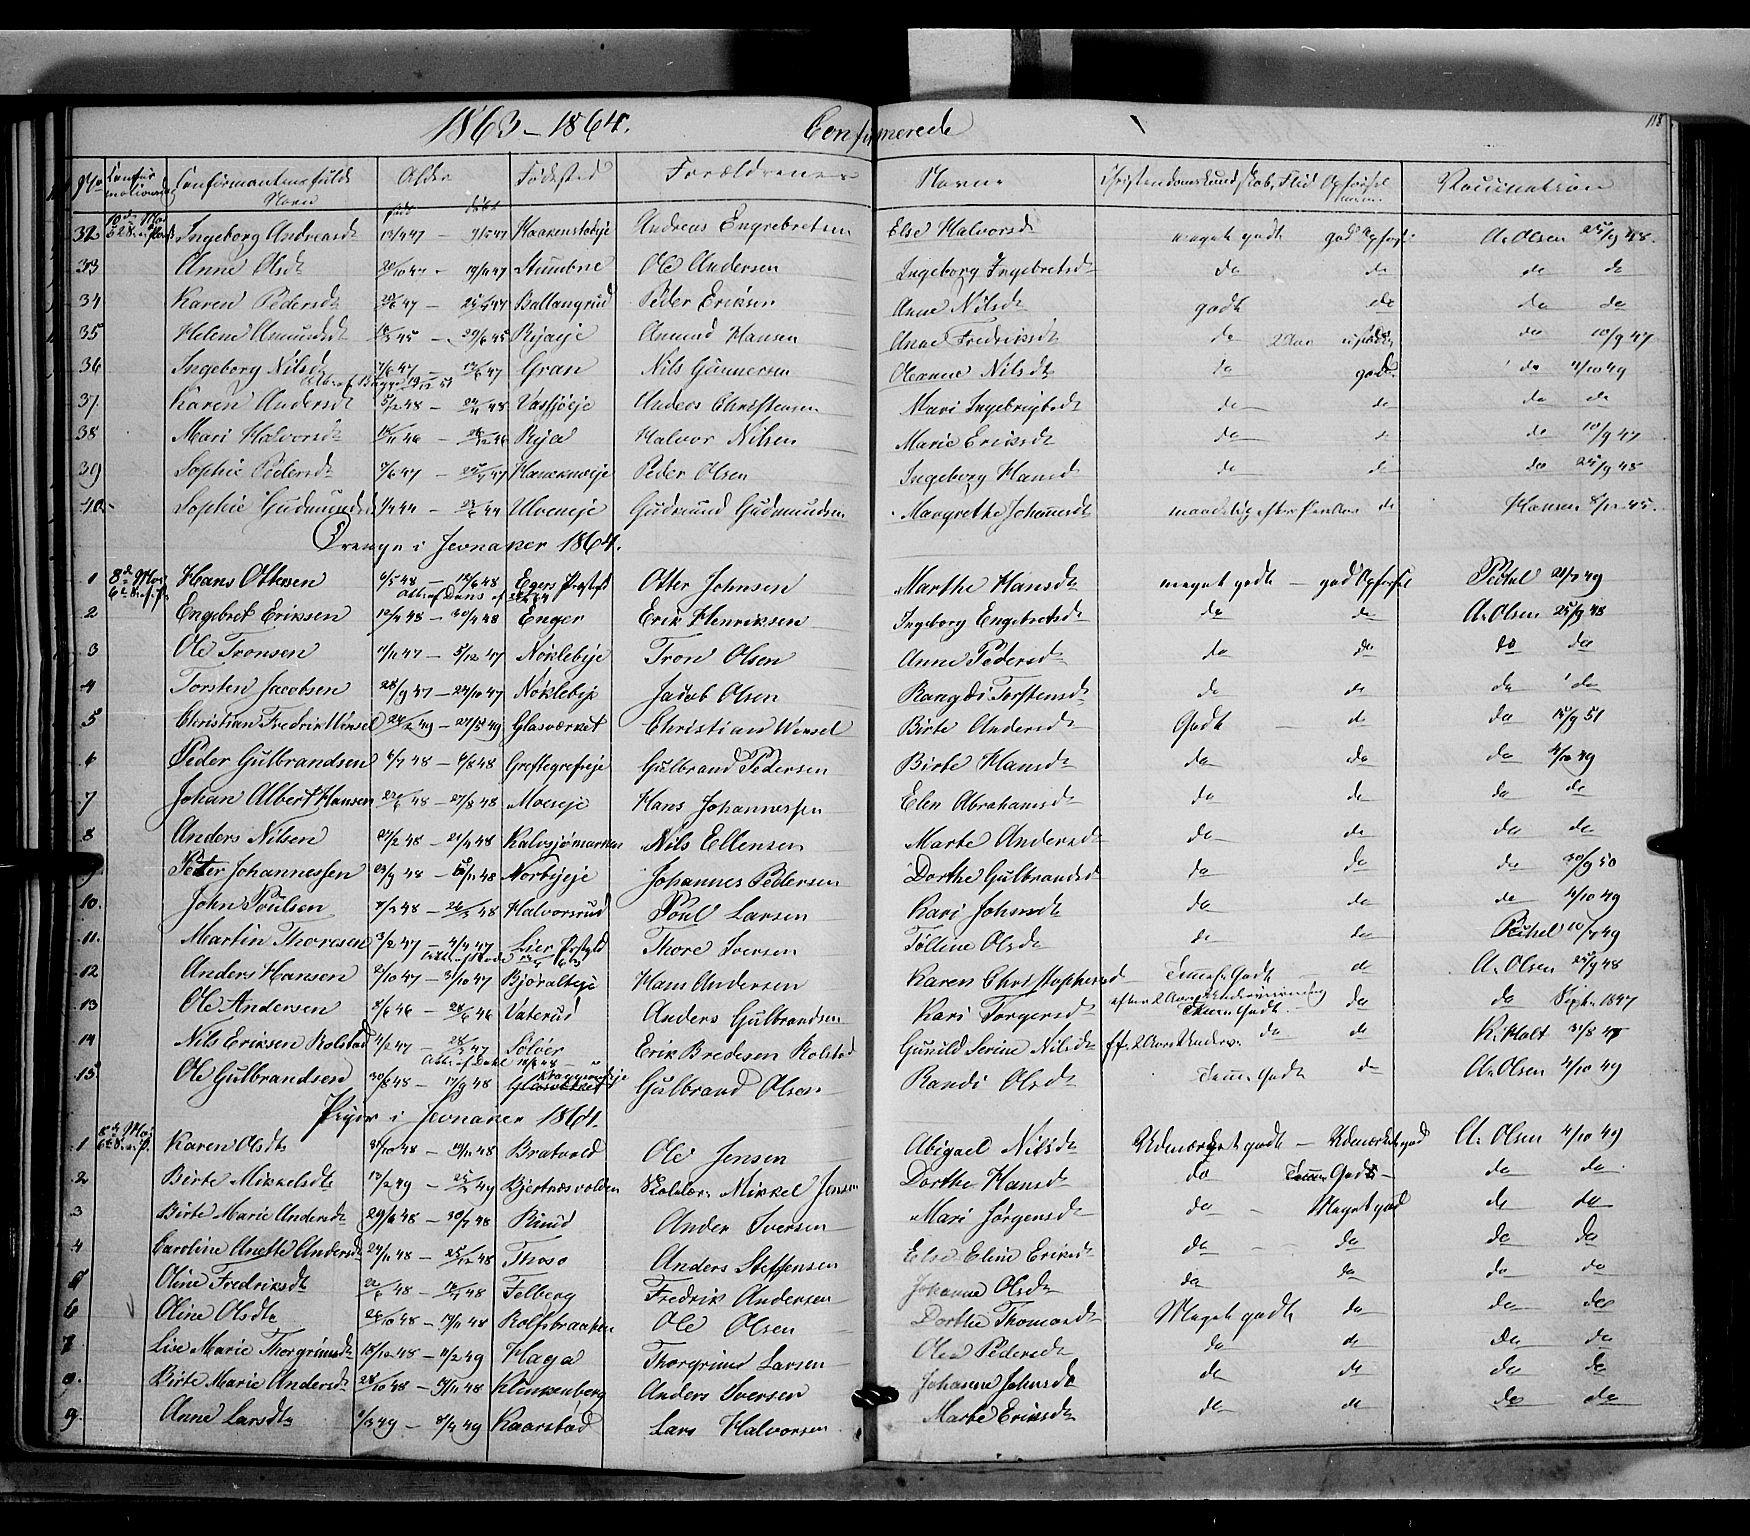 SAH, Jevnaker prestekontor, Ministerialbok nr. 7, 1858-1876, s. 118